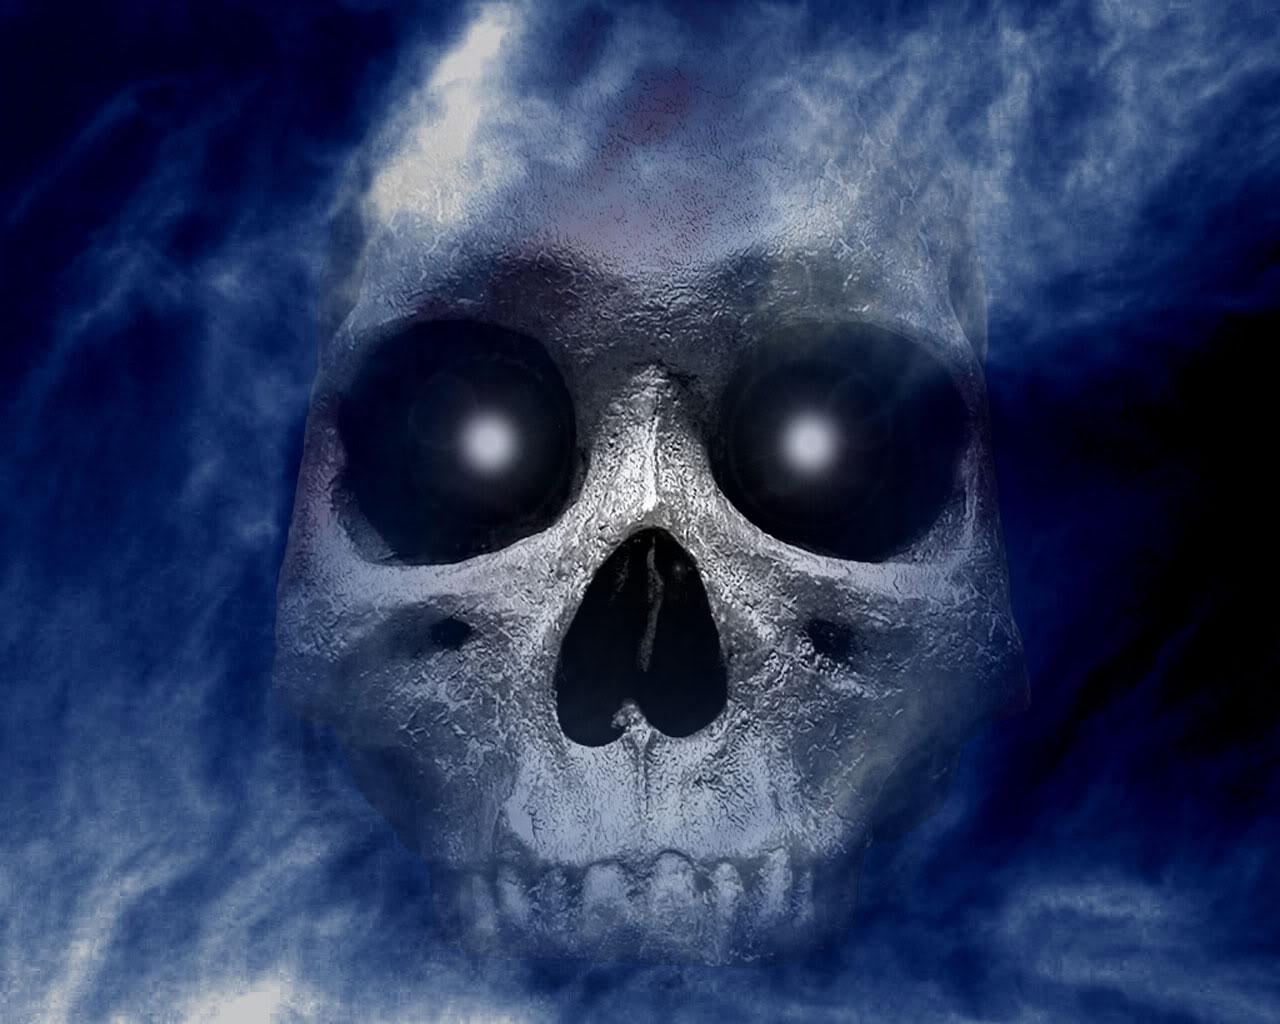 http://2.bp.blogspot.com/-FZQeLzCeRhk/T9Xzy6Zp13I/AAAAAAAAAMg/key4uvQsEUM/s1600/scary-skull-wallpapers.jpg